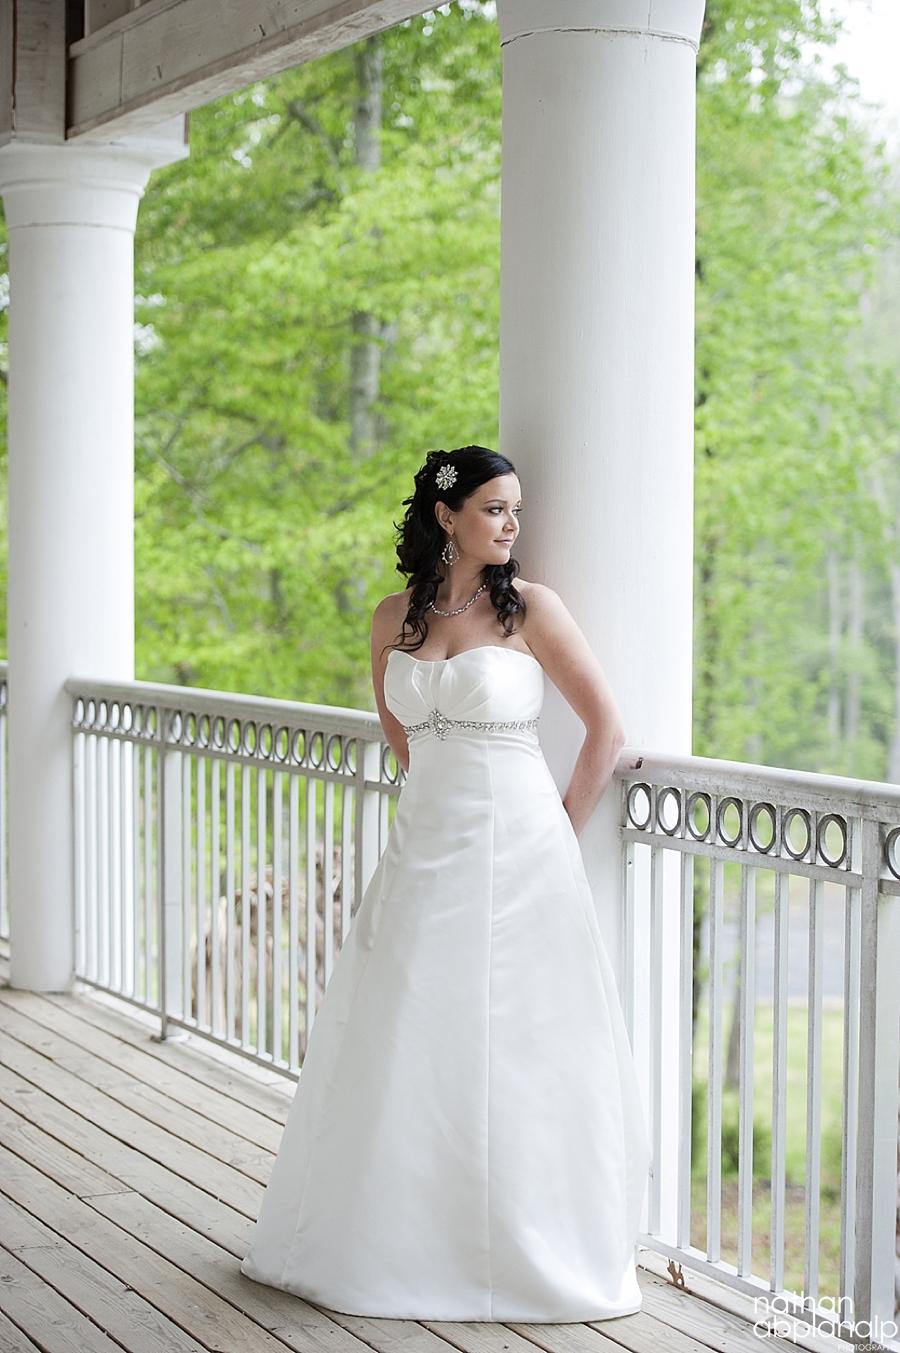 Nathan Abplanalp - Charlotte Wedding Photographer (15)